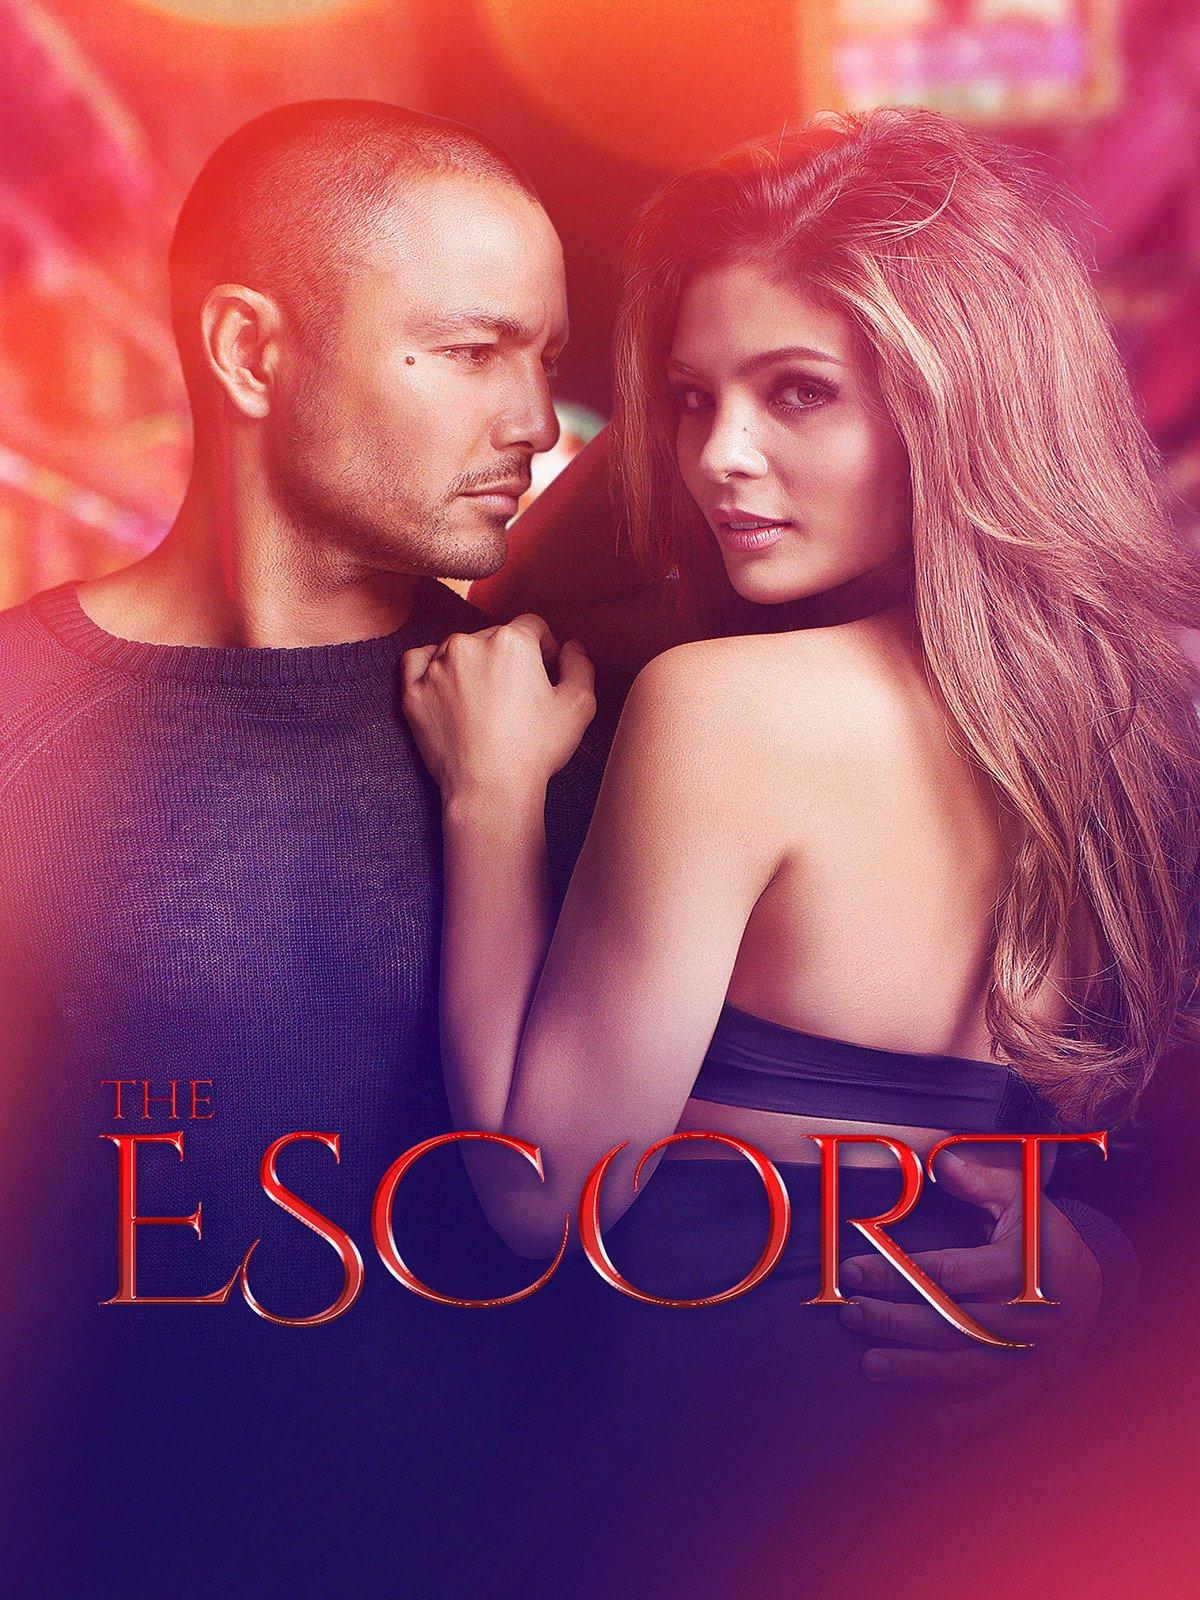 film erotic streaming annonces escorts